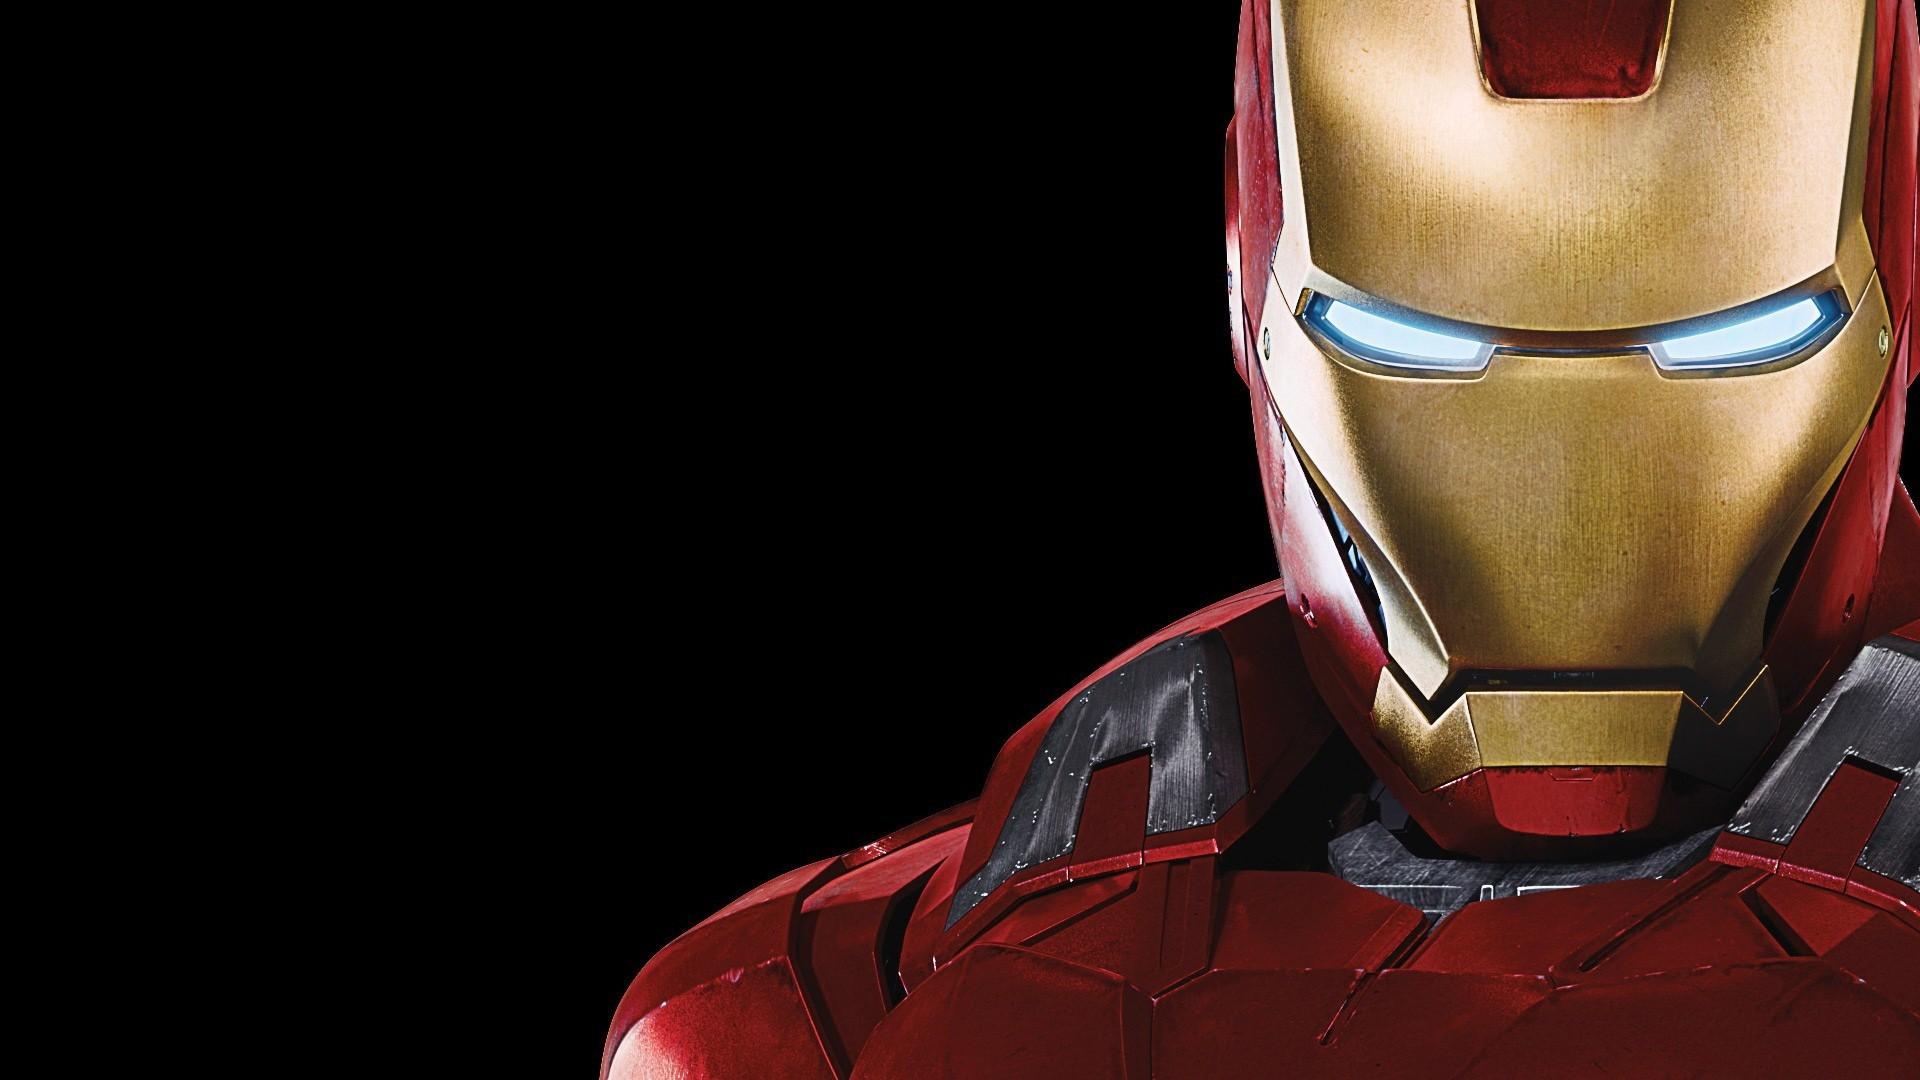 Iron Man Wallpaper HD 8968 1920x1080 px HDWallSourcecom 1920x1080